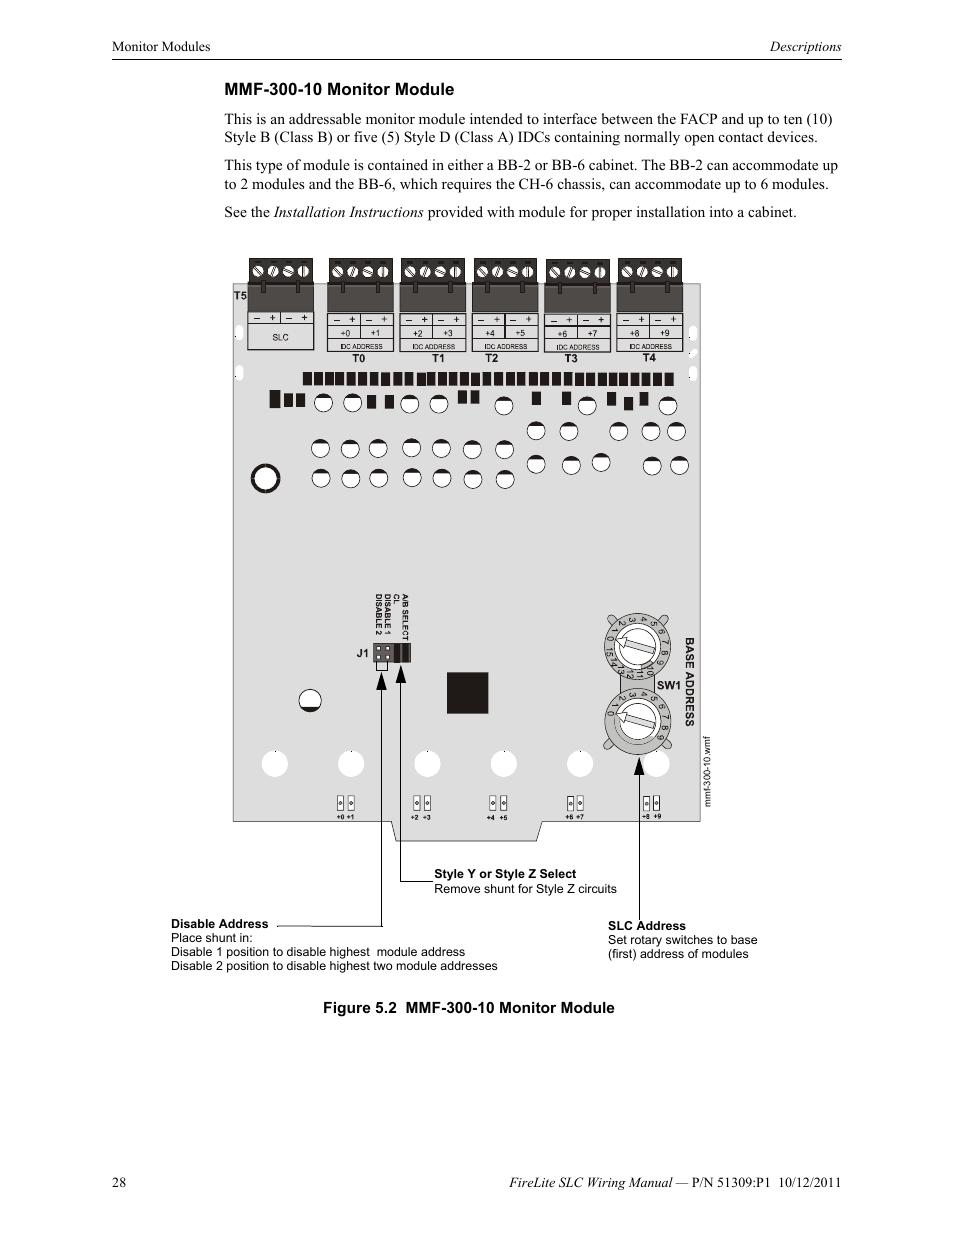 Wiring Diagram Shunt Intelligent Wire Data Schema Home Outlet House Diagrams Darren Criss Mmf 300 10 Monitor Module Fire Lite Slc Control Panel Rh Manualsdir Com Ge Breaker